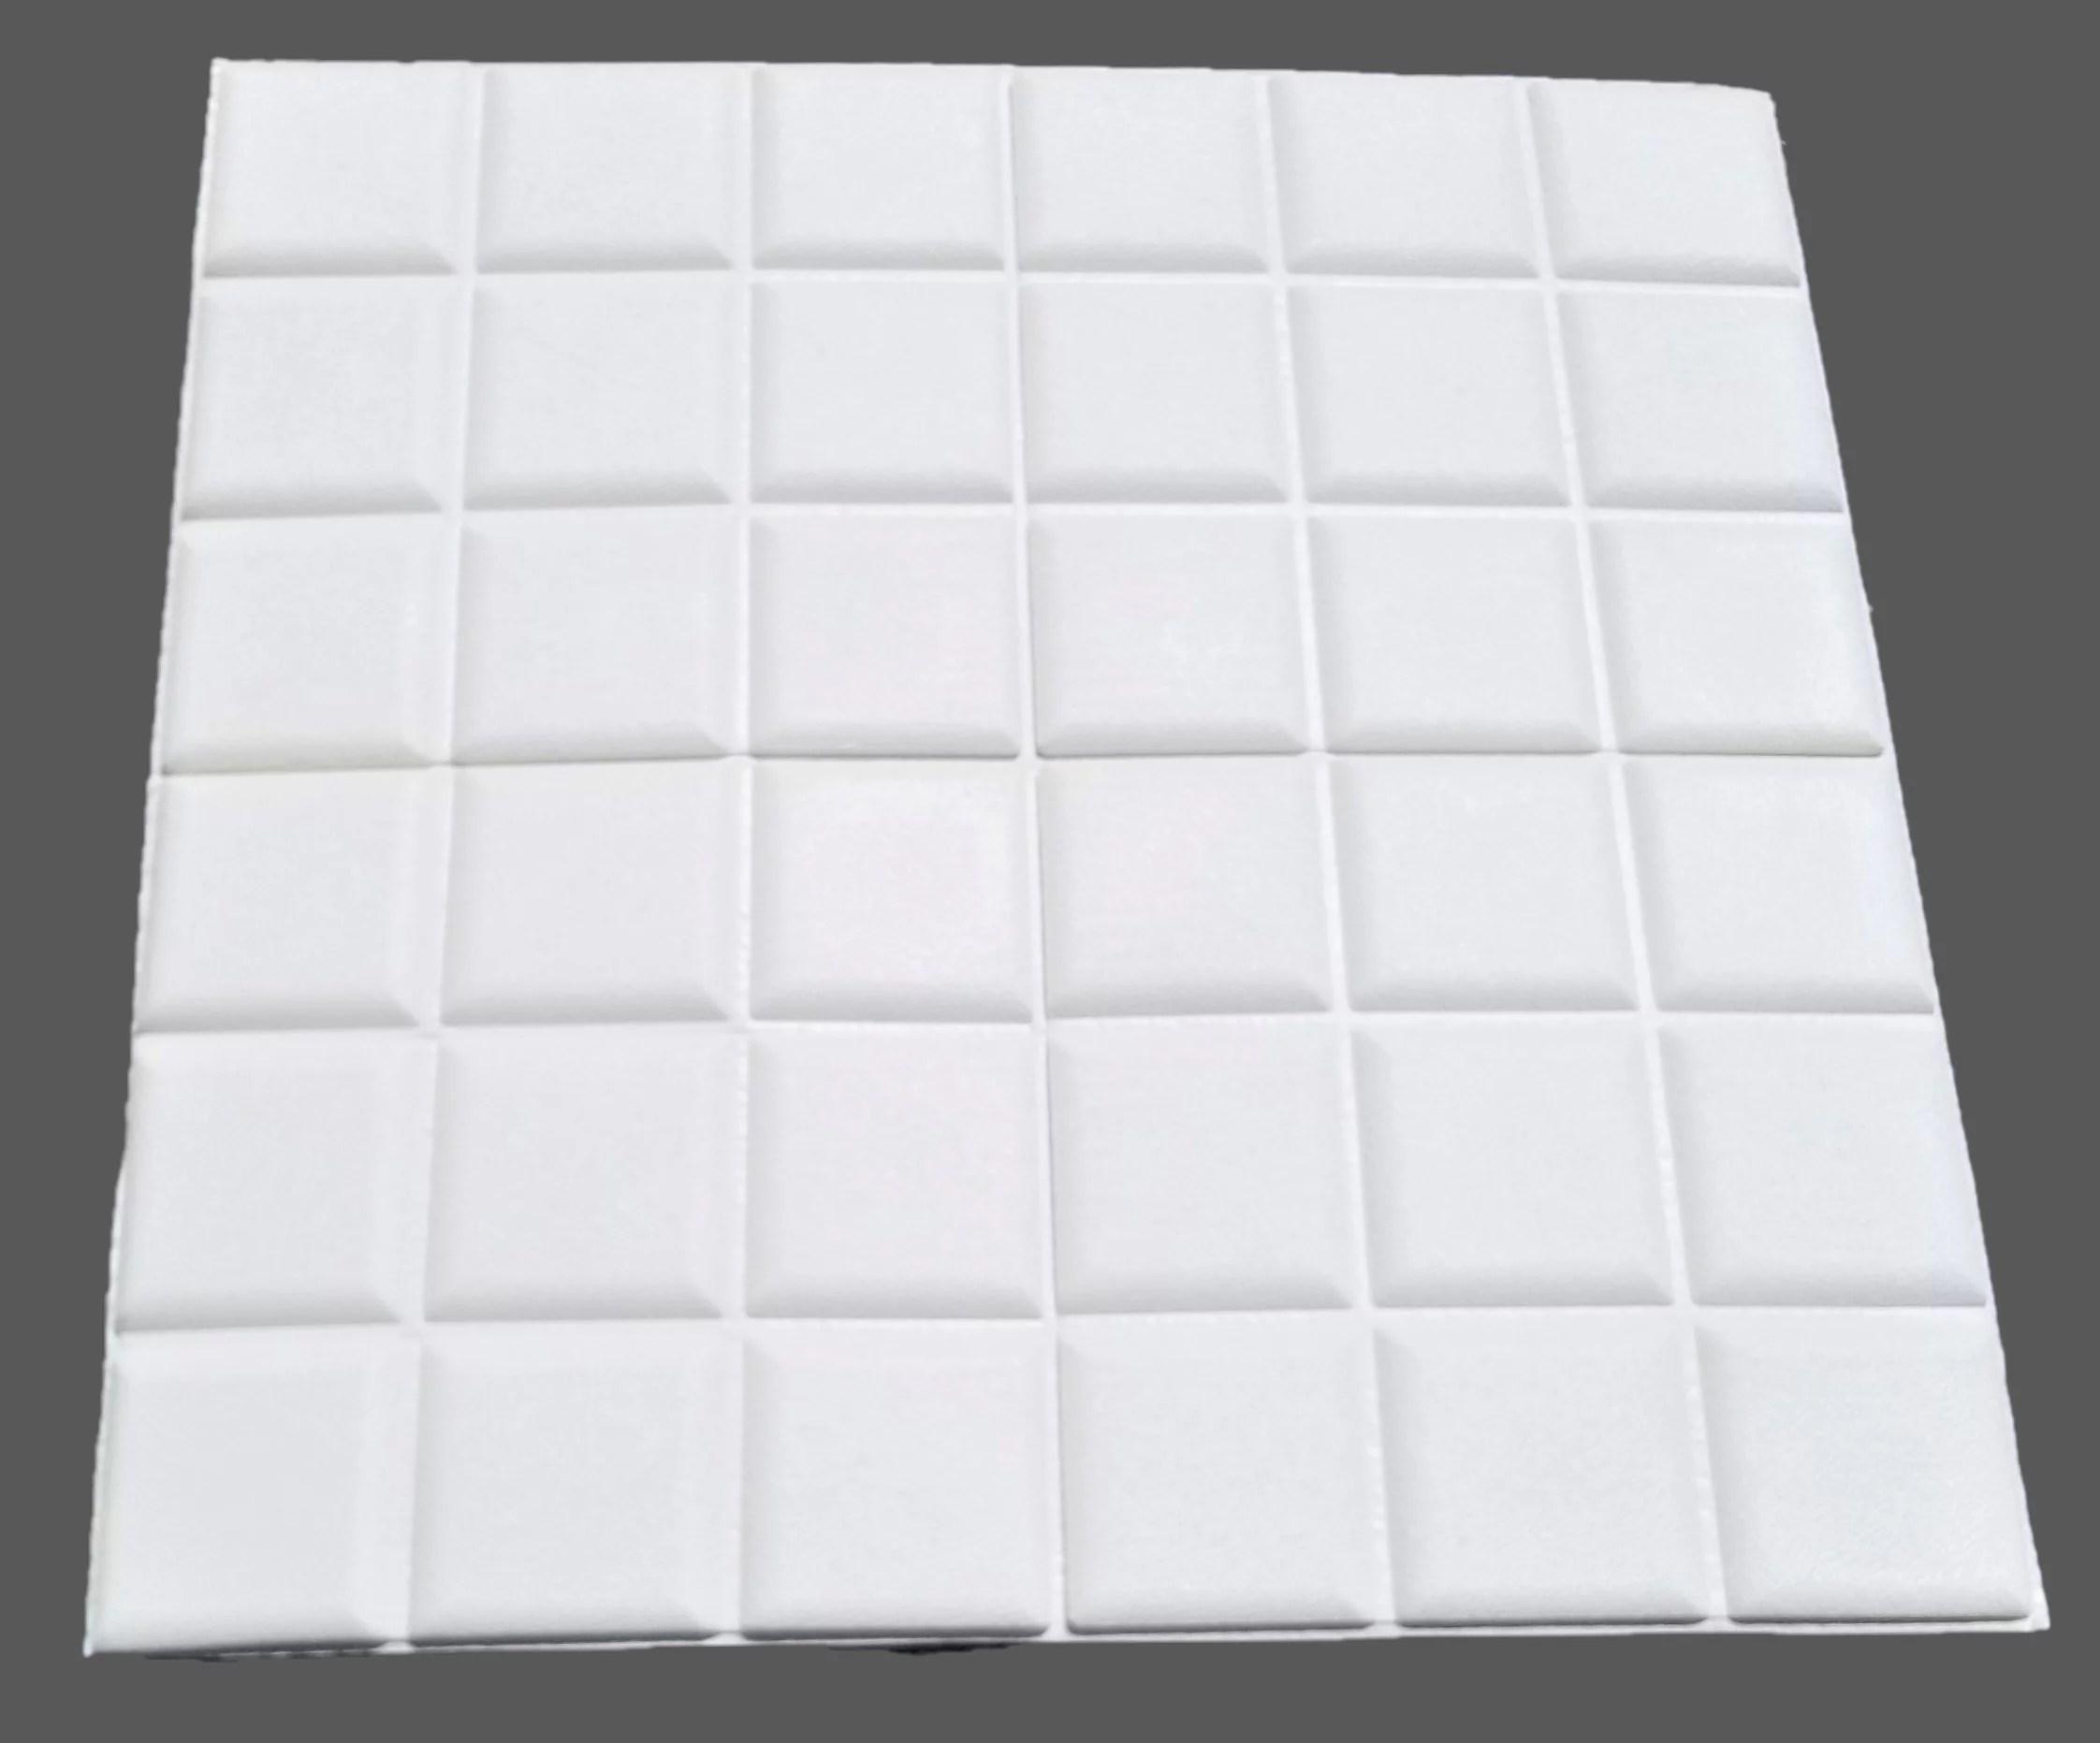 3d wallpaper foam ceiling wall tiles peel stick home decorative tiles panels